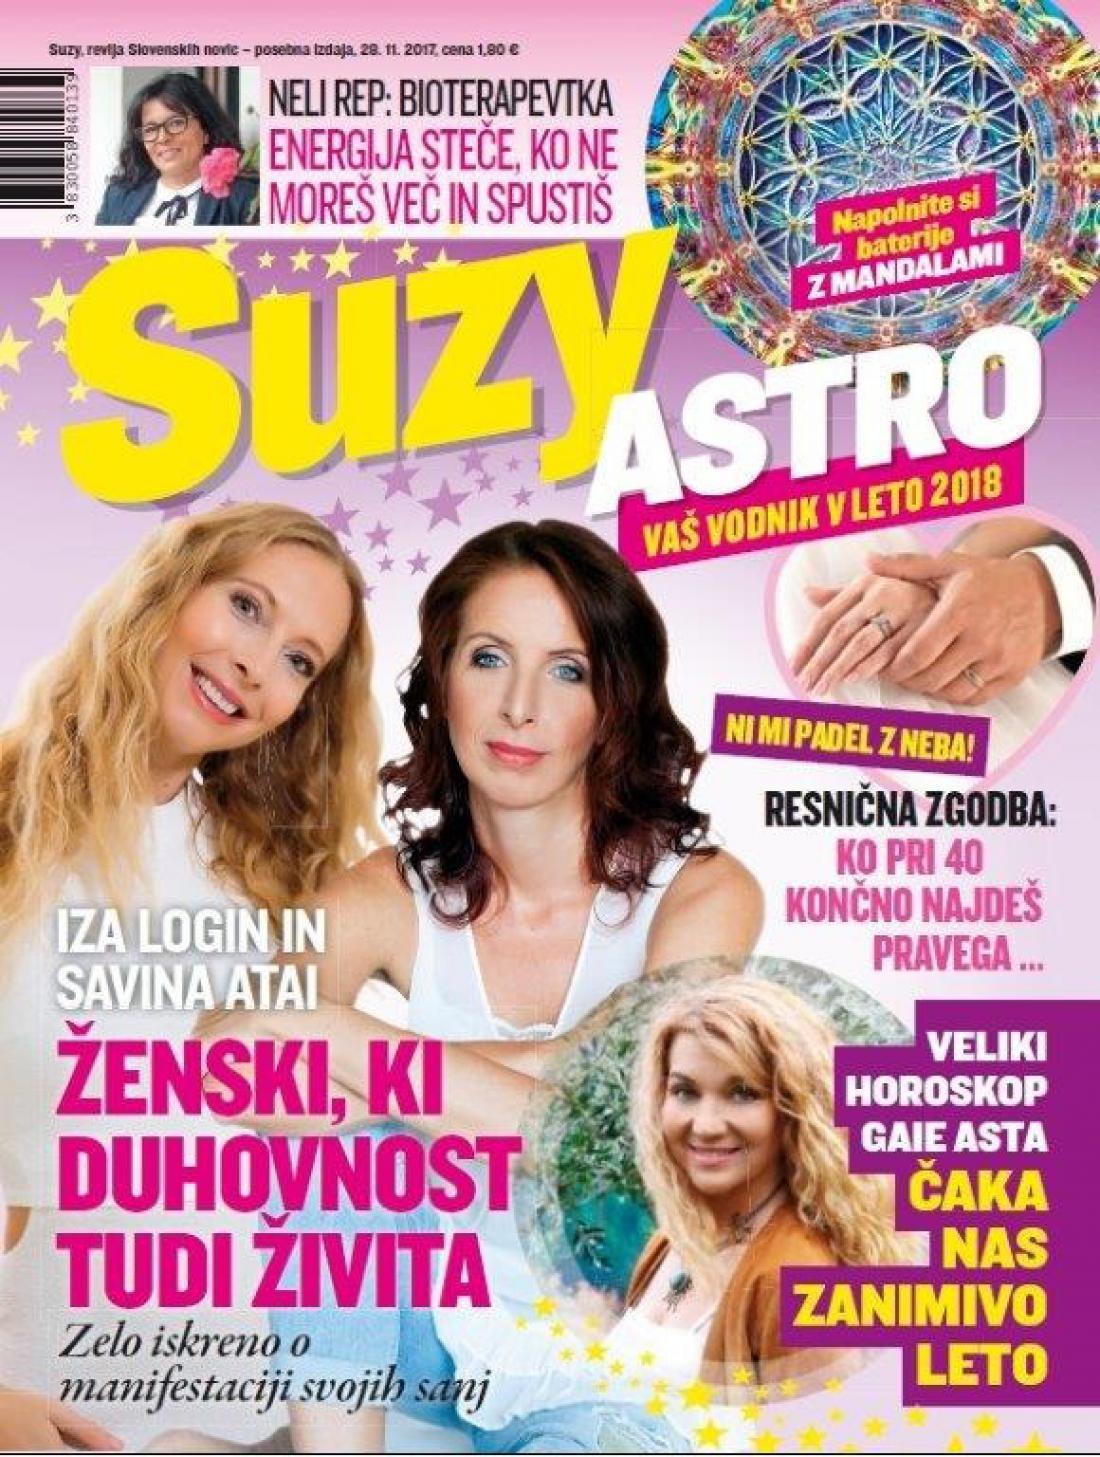 naslovnica suzy large